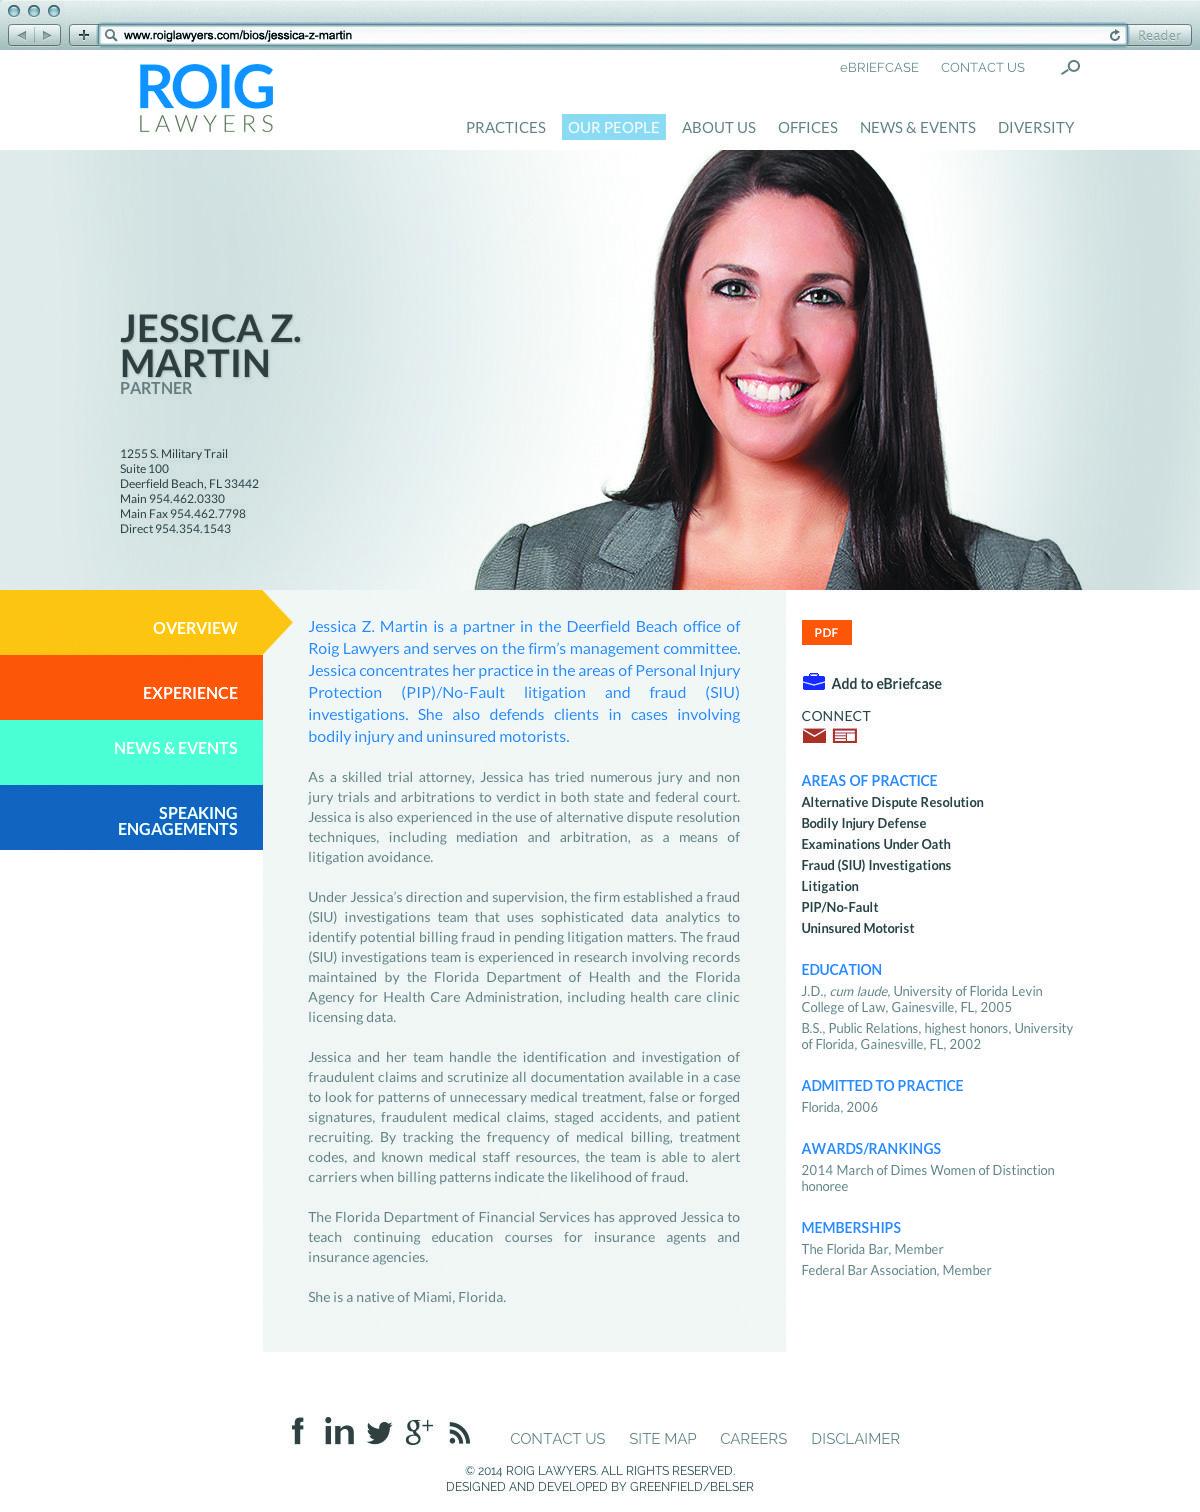 Roig Lawyers Bio Detail Page Web Development Design Law Firm Marketing Lawyer